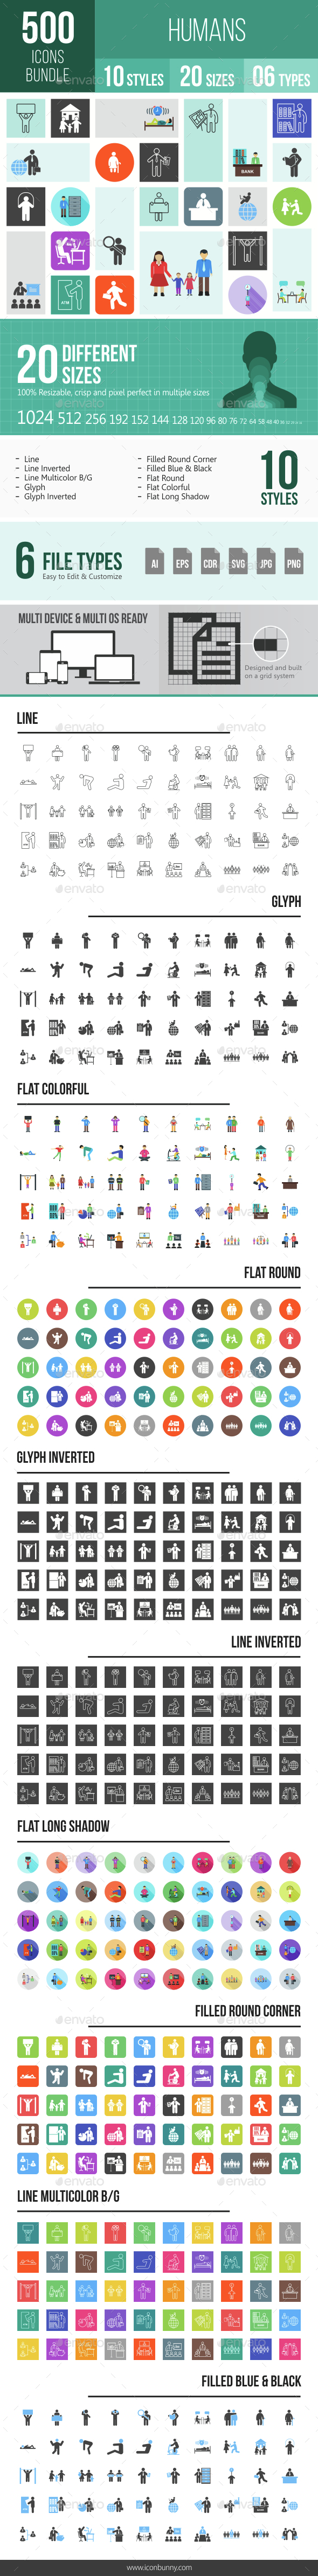 500 Humans Icons Bundle - Icons